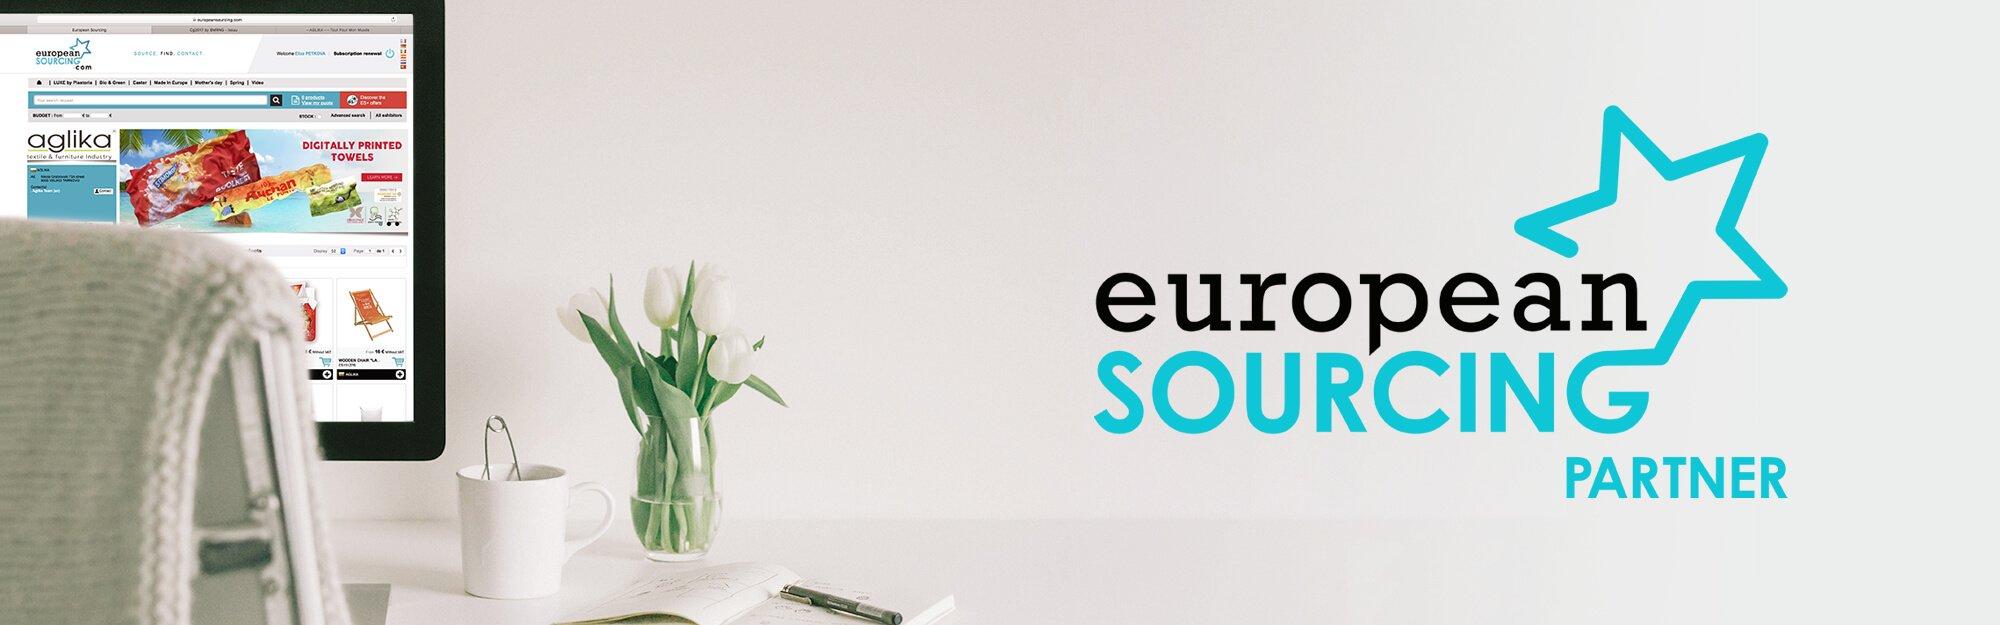 european-sourcing-4